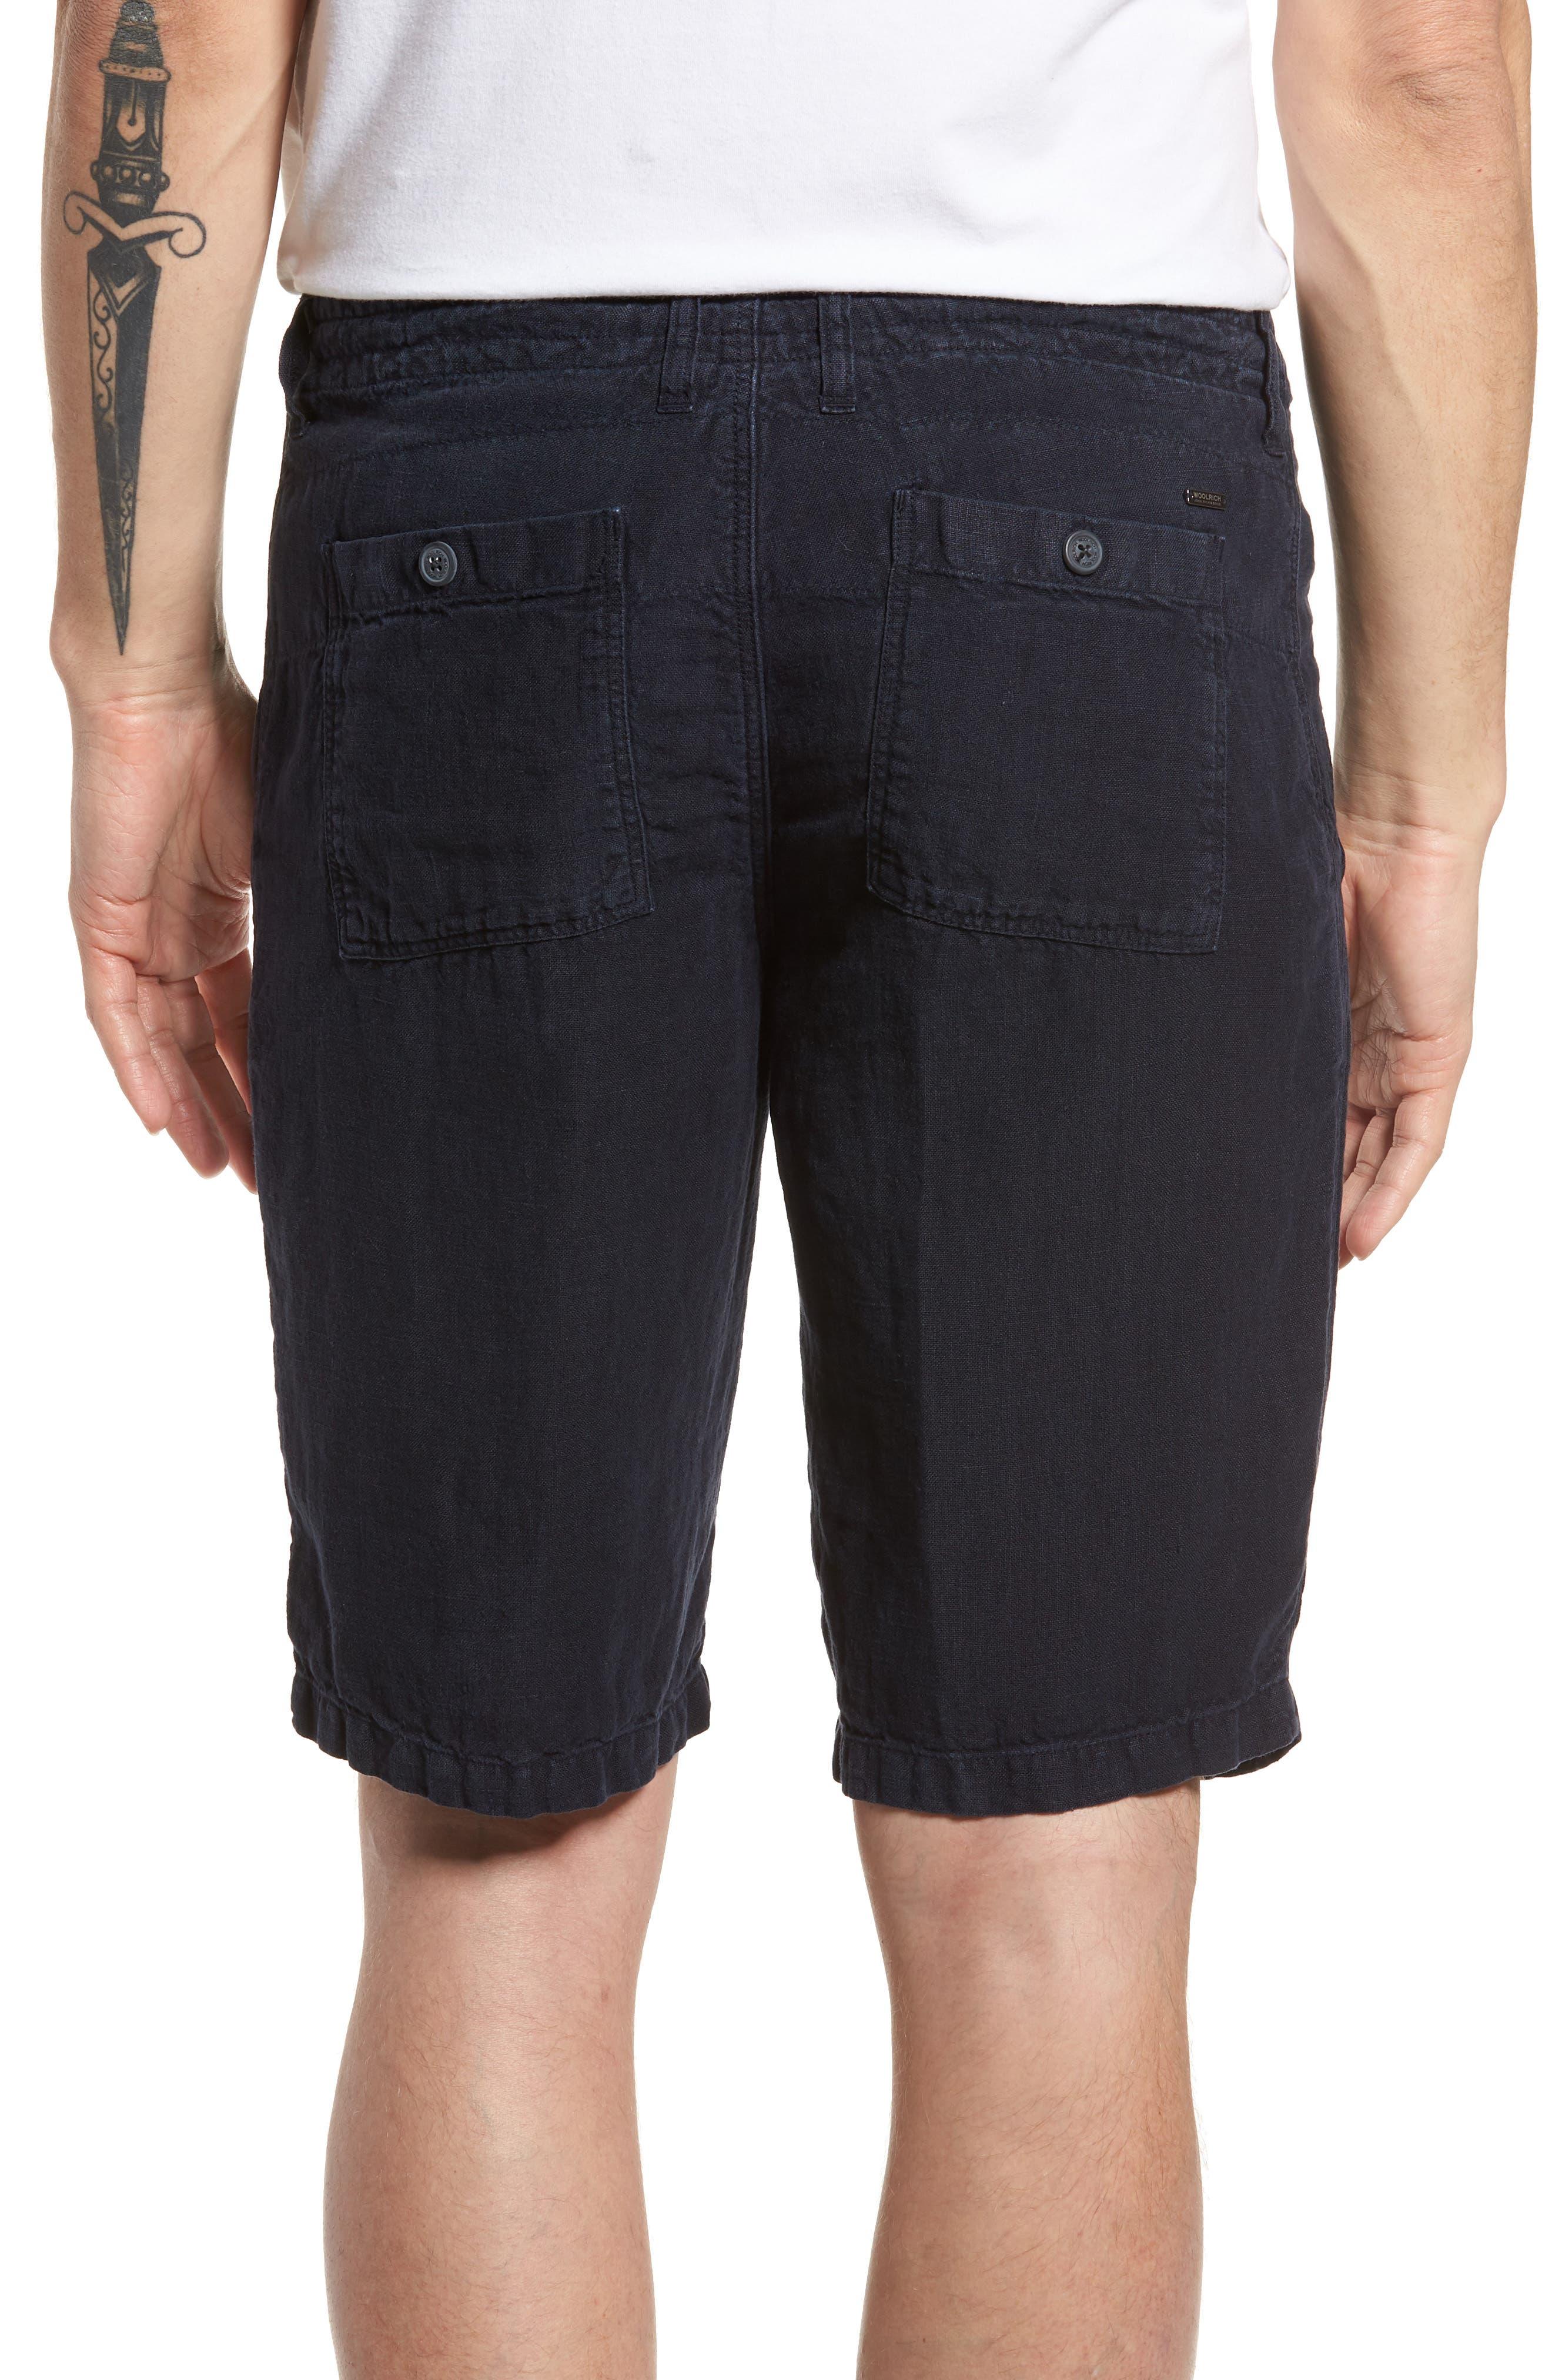 & Bros. Linen Shorts,                             Alternate thumbnail 2, color,                             400